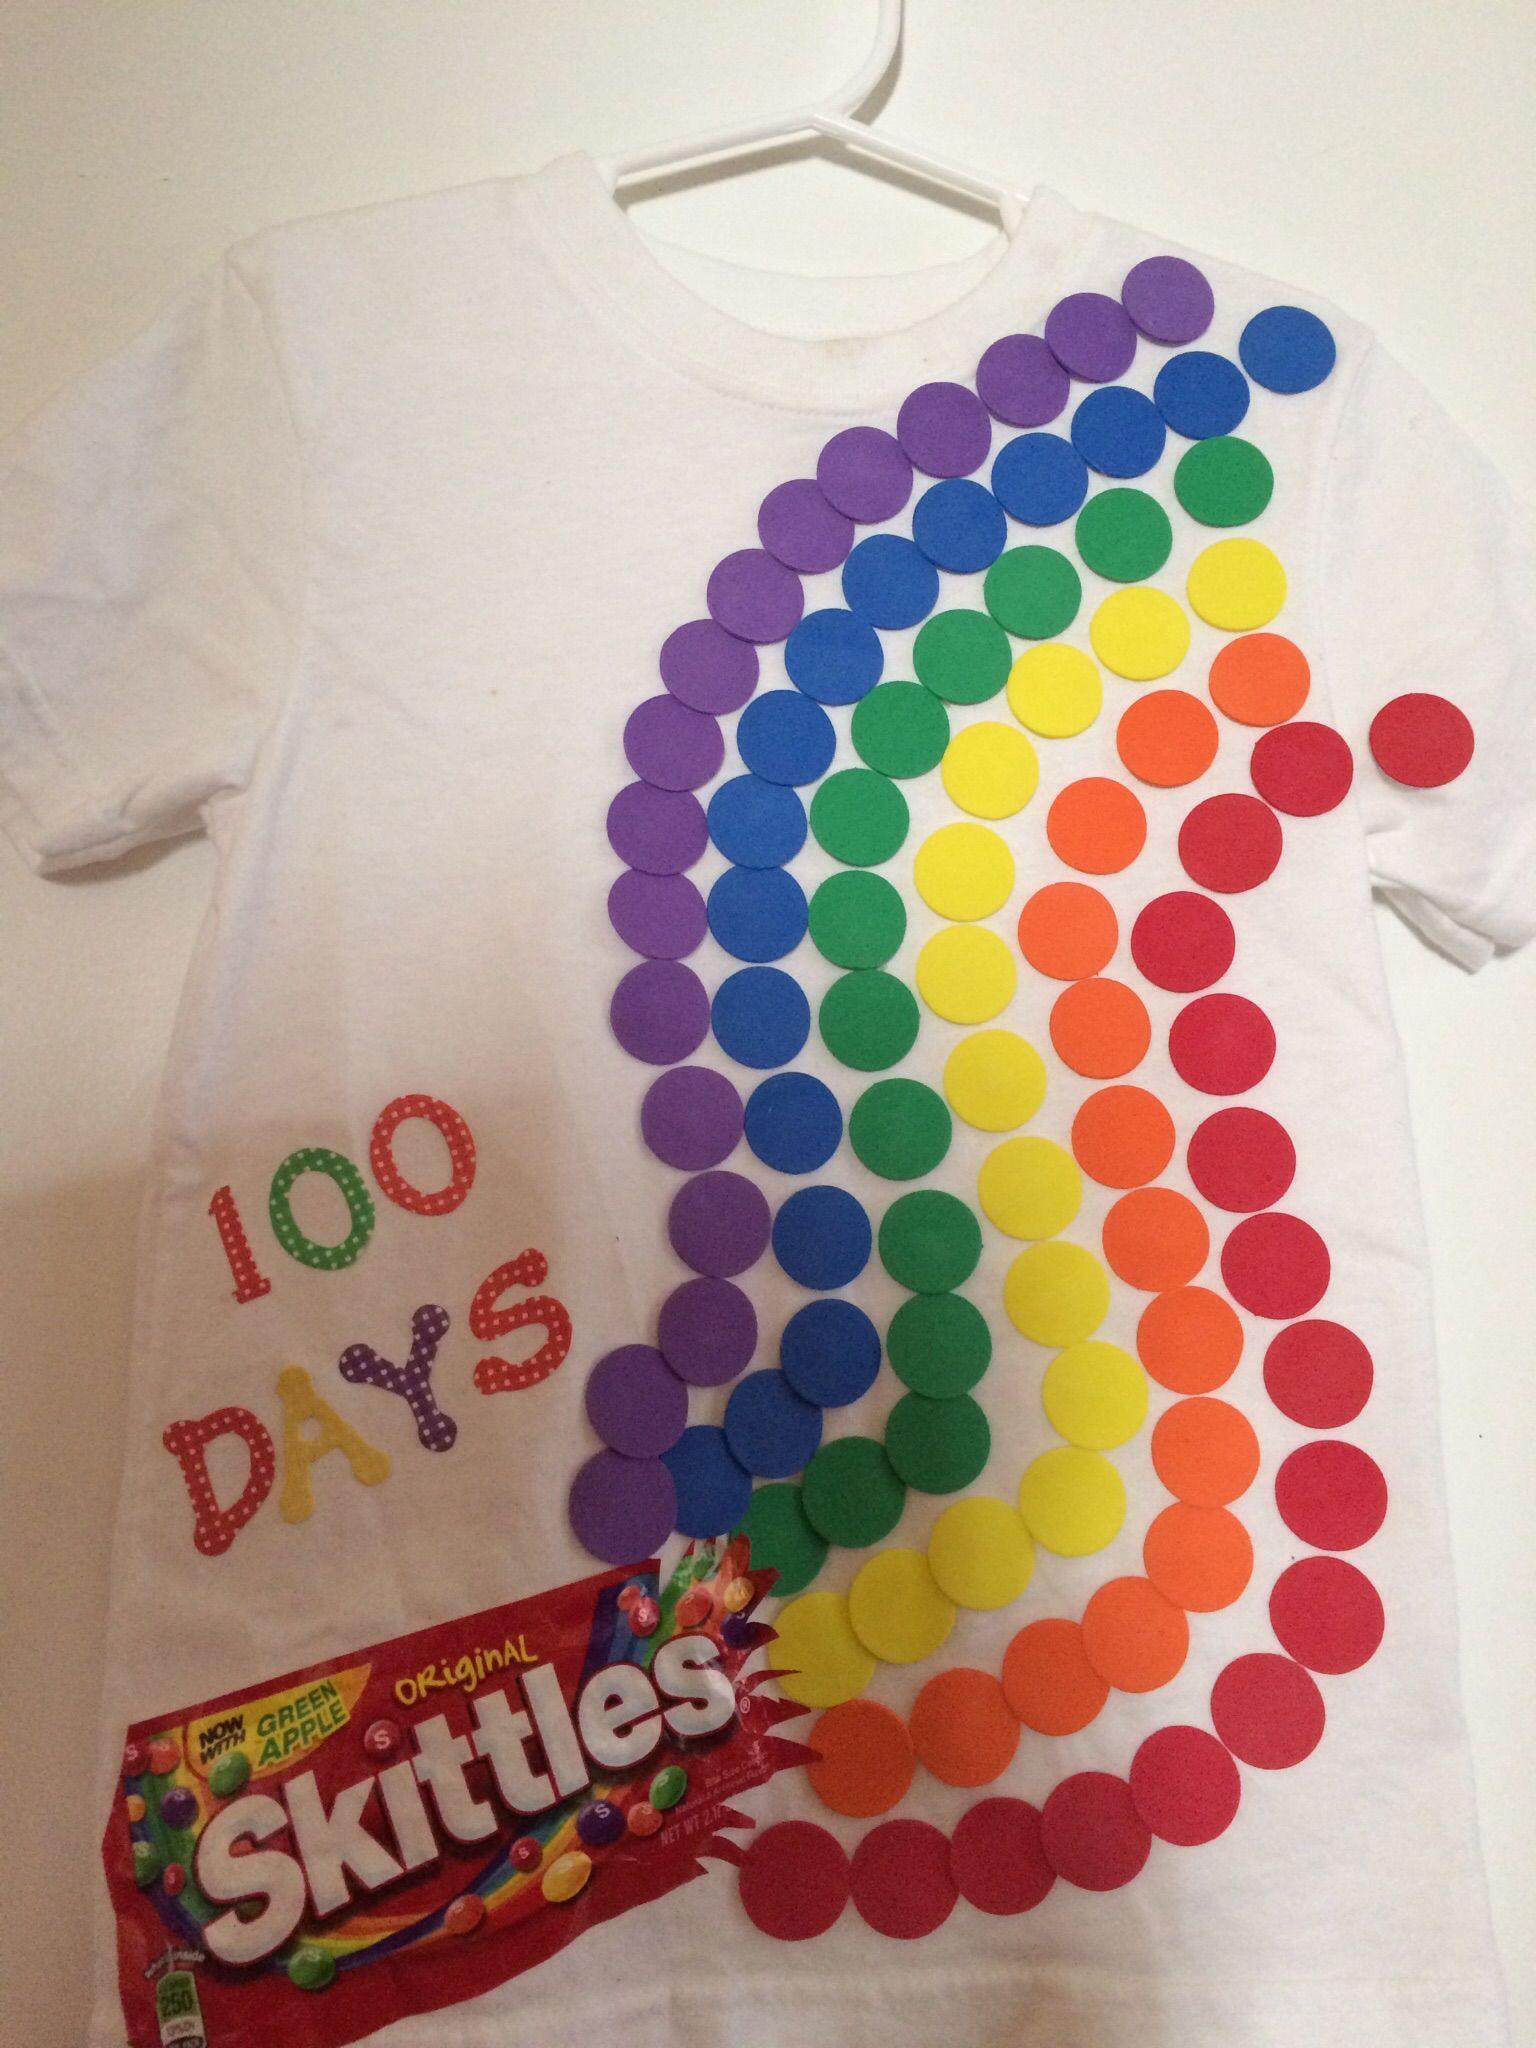 100th Day Of School Skittles Tee